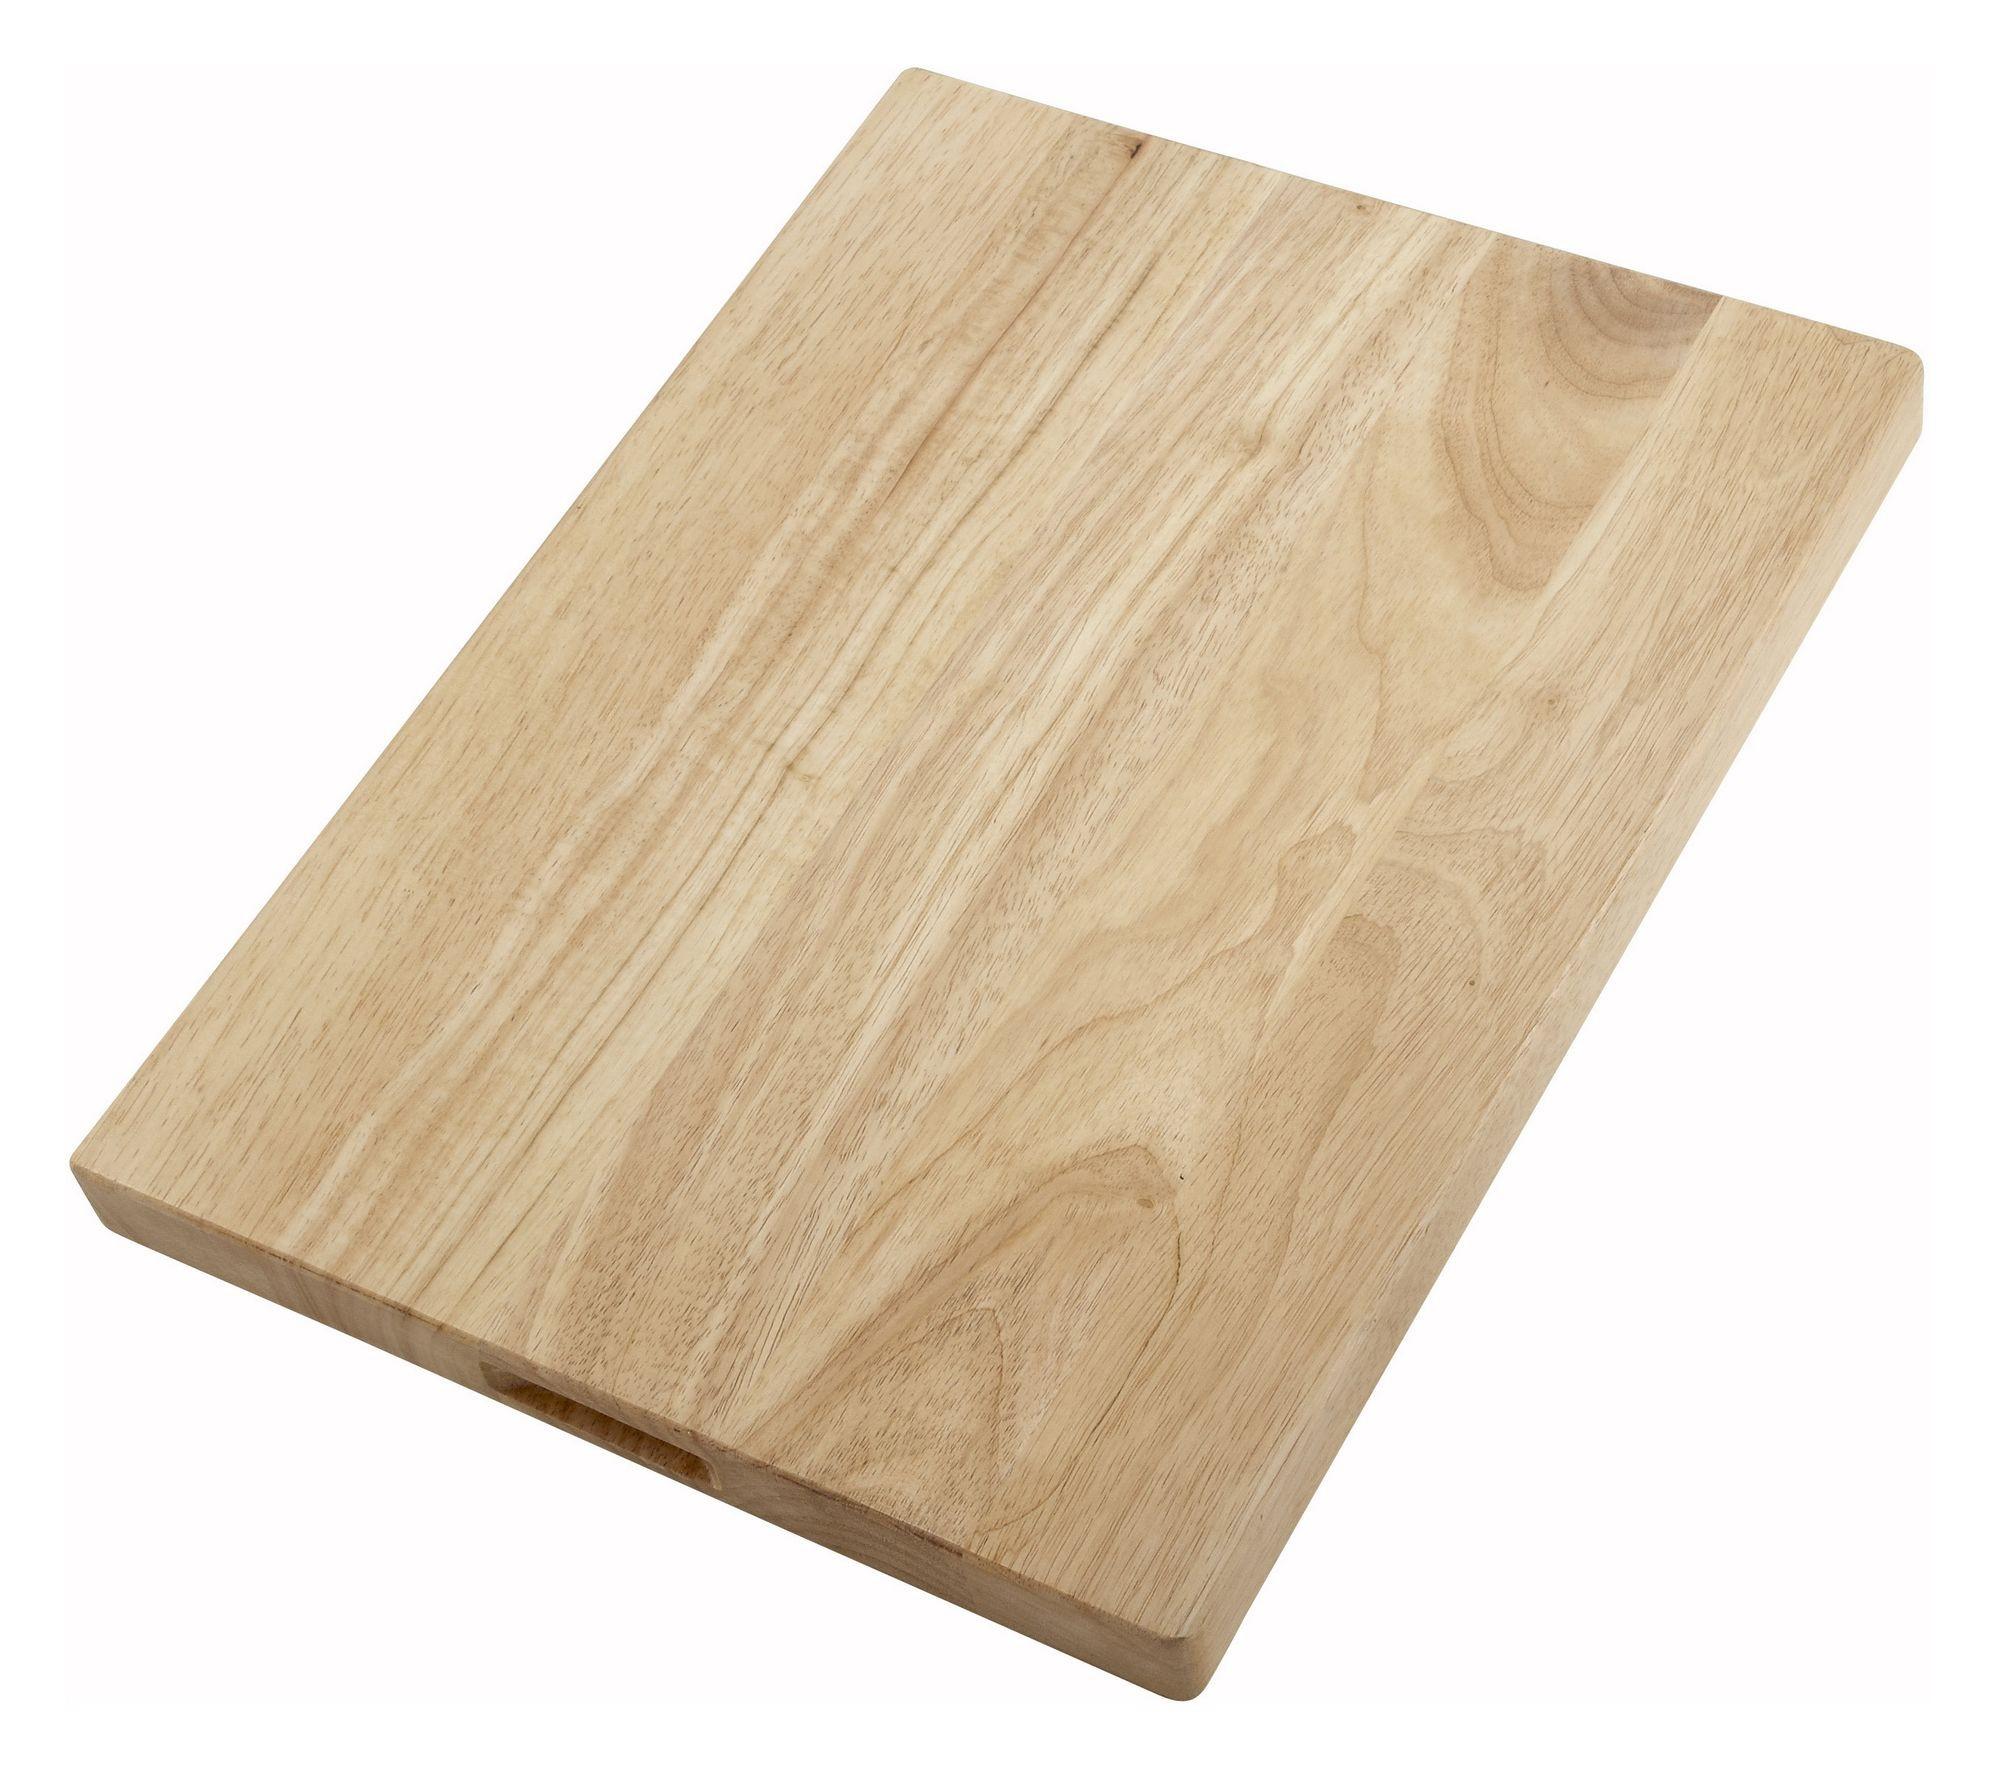 Wood Butcher Block - 15 X 20 X 1-3/4 Thick